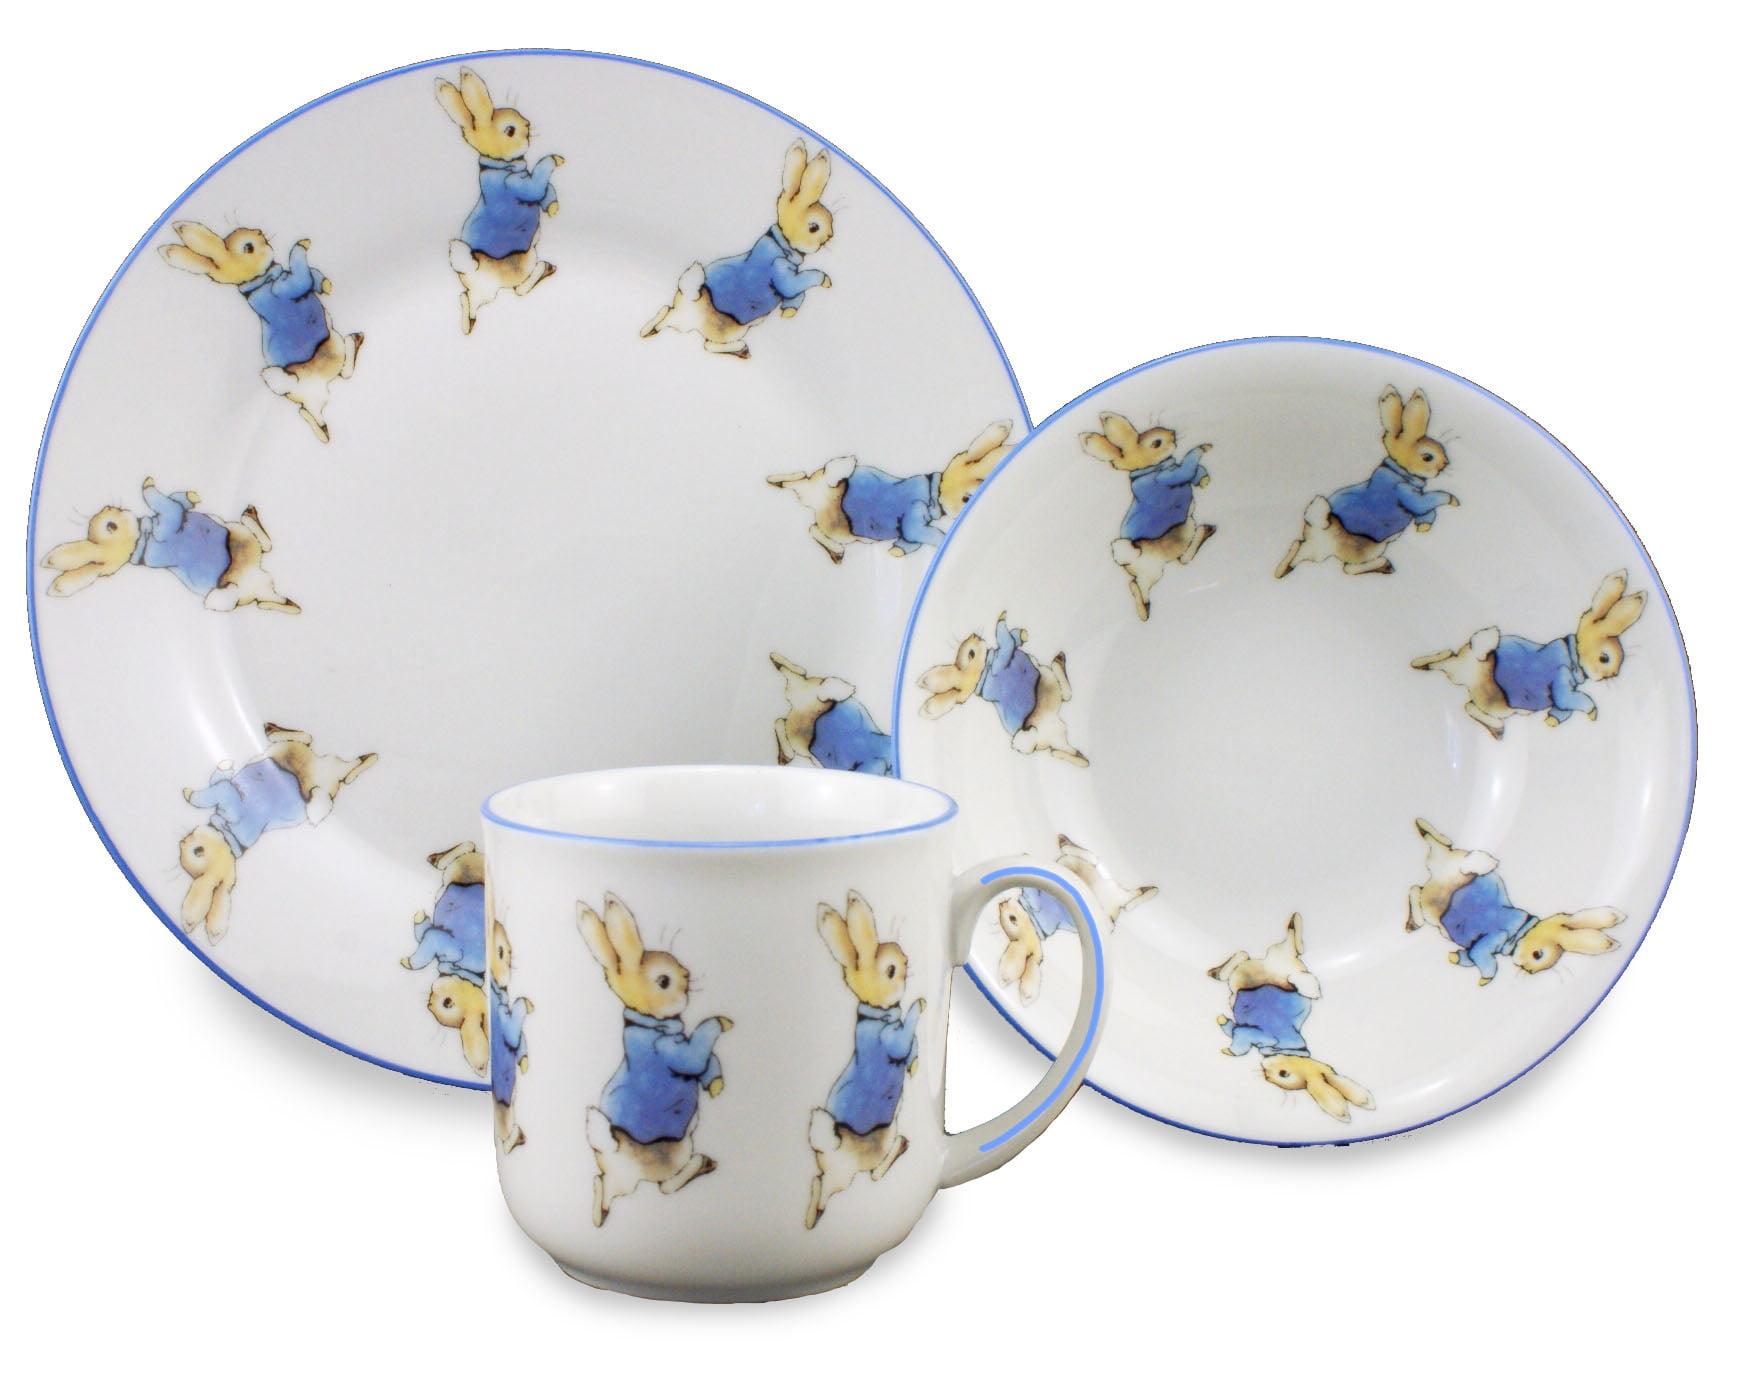 Peter Rabbit 3 Piece Porcelain Childu0027s Breakfast Set The World of Beatrix Potter  sc 1 st  Always Hobbies & Peter Rabbit 3 Piece Childu0027s Breakfast Set Reutter Porcelain ...